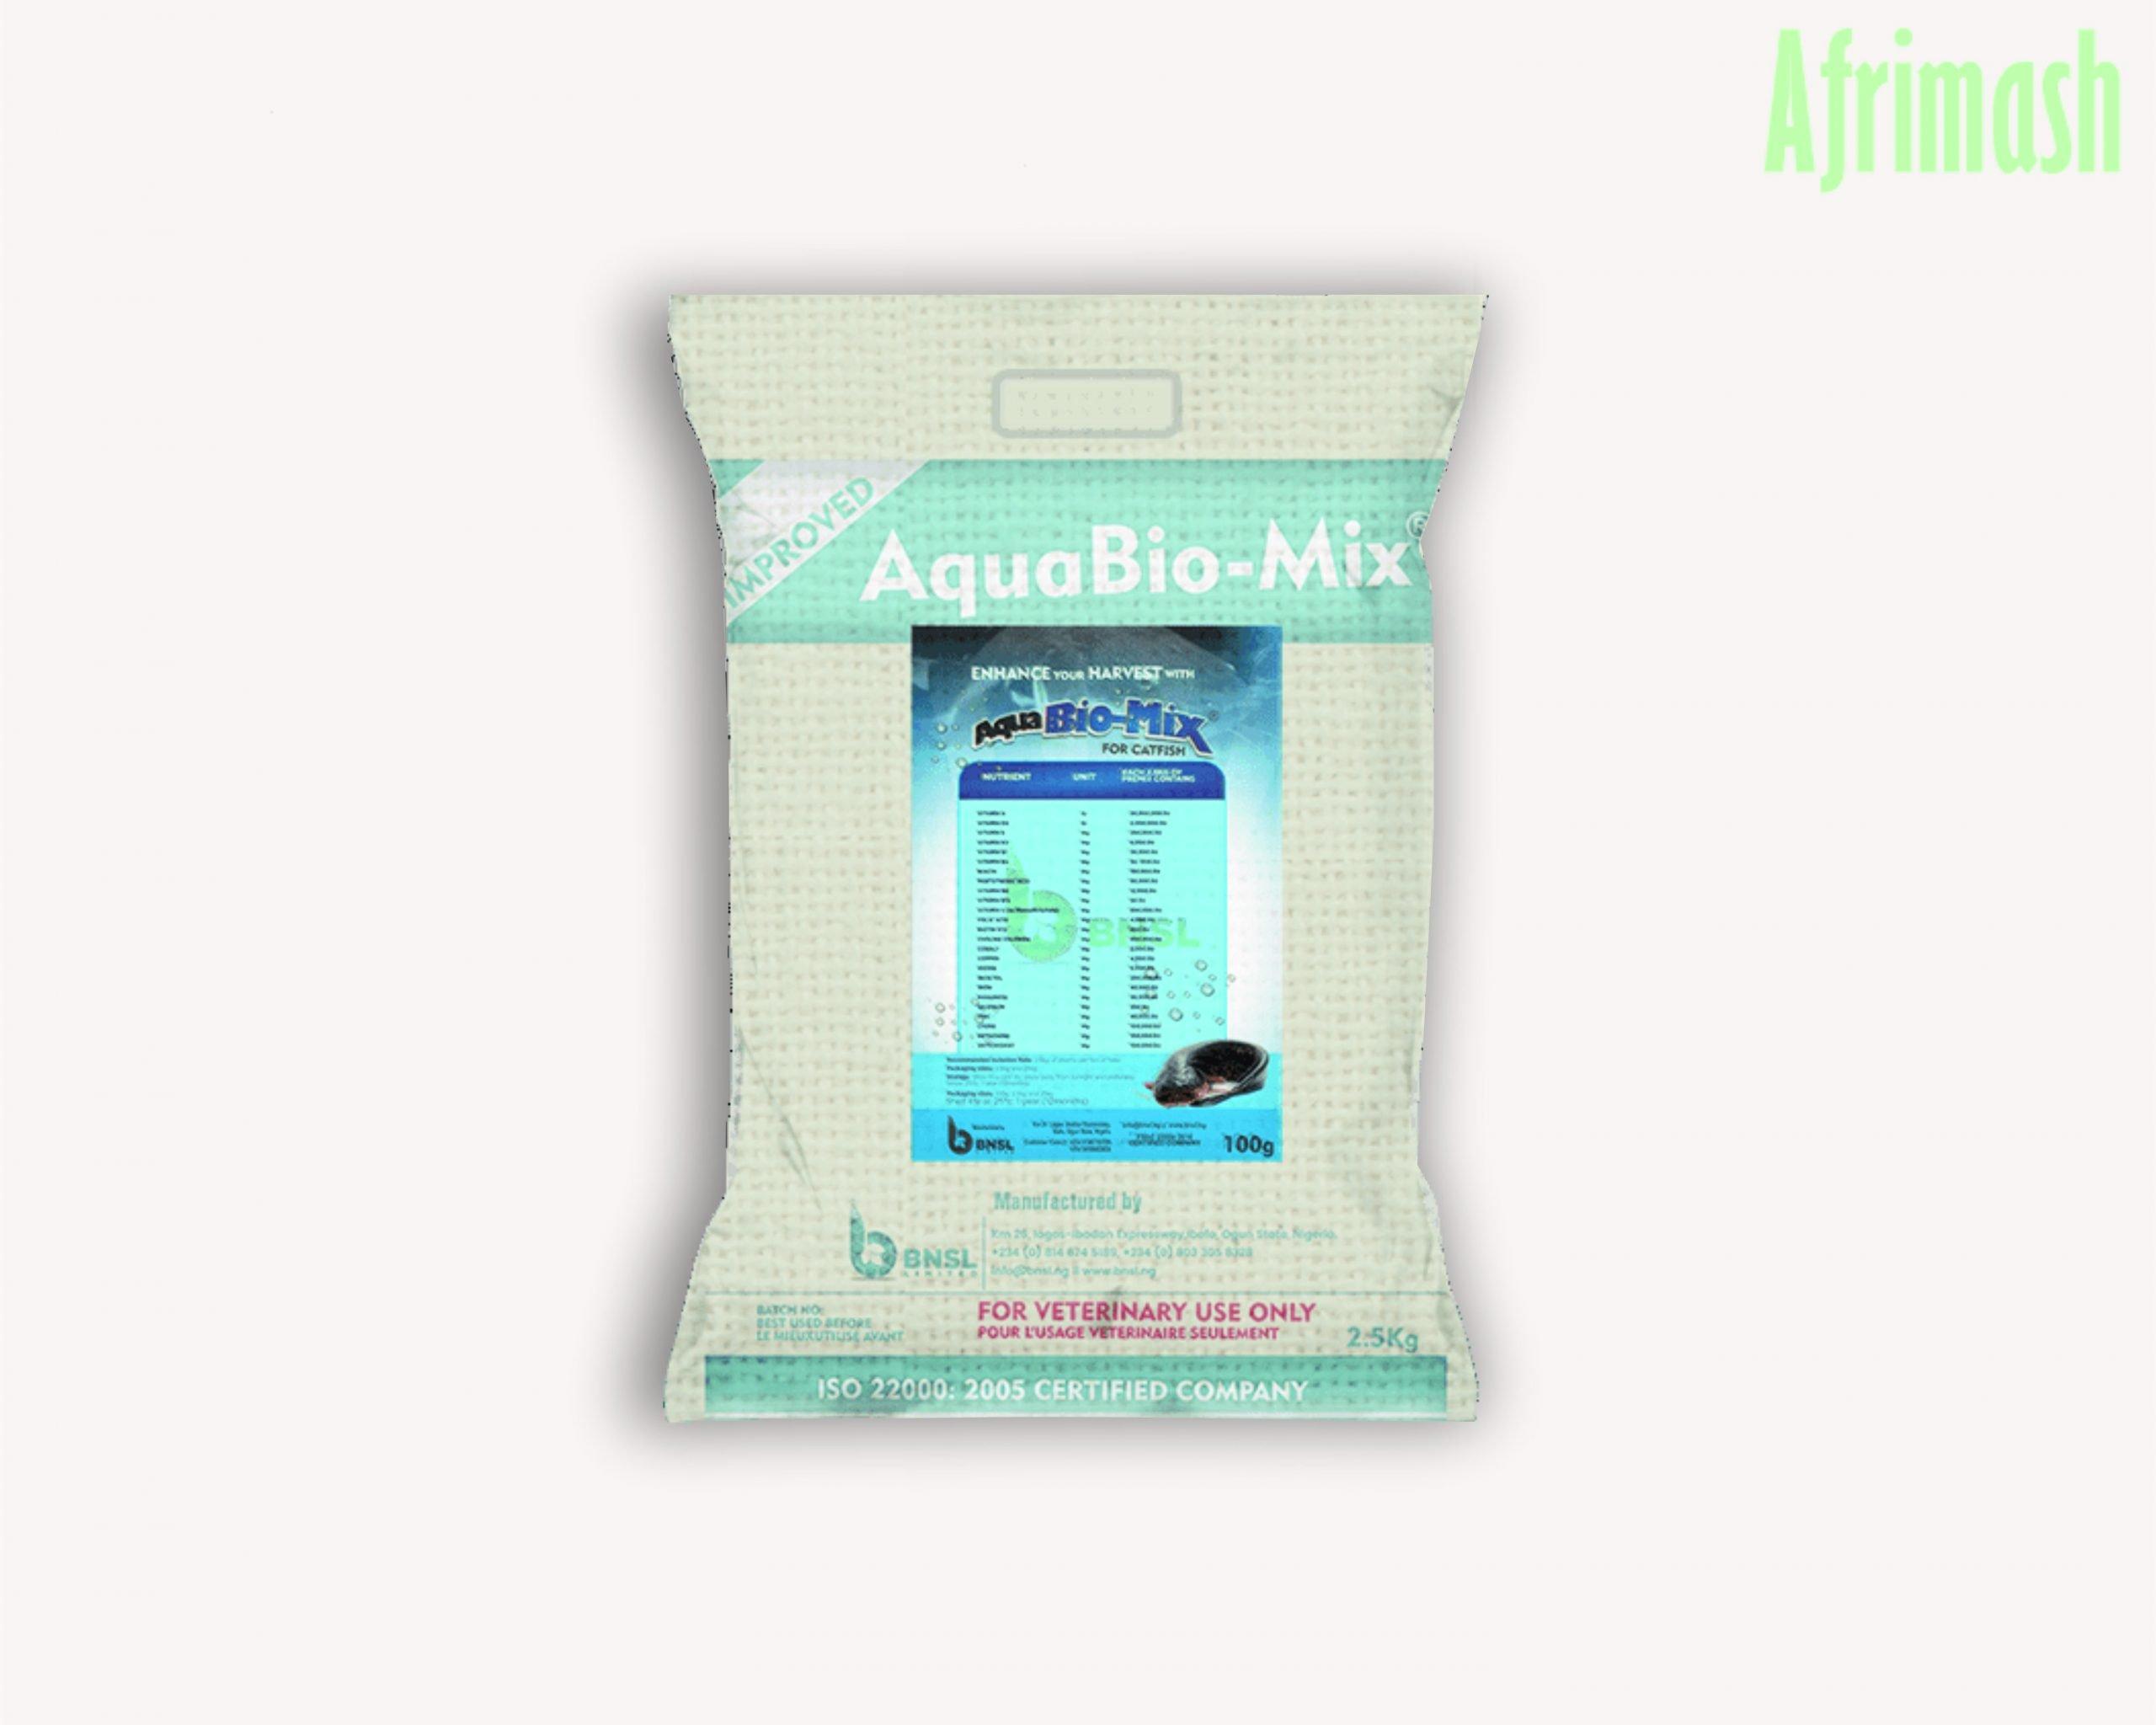 Aqua Bio-Mix for Catfish